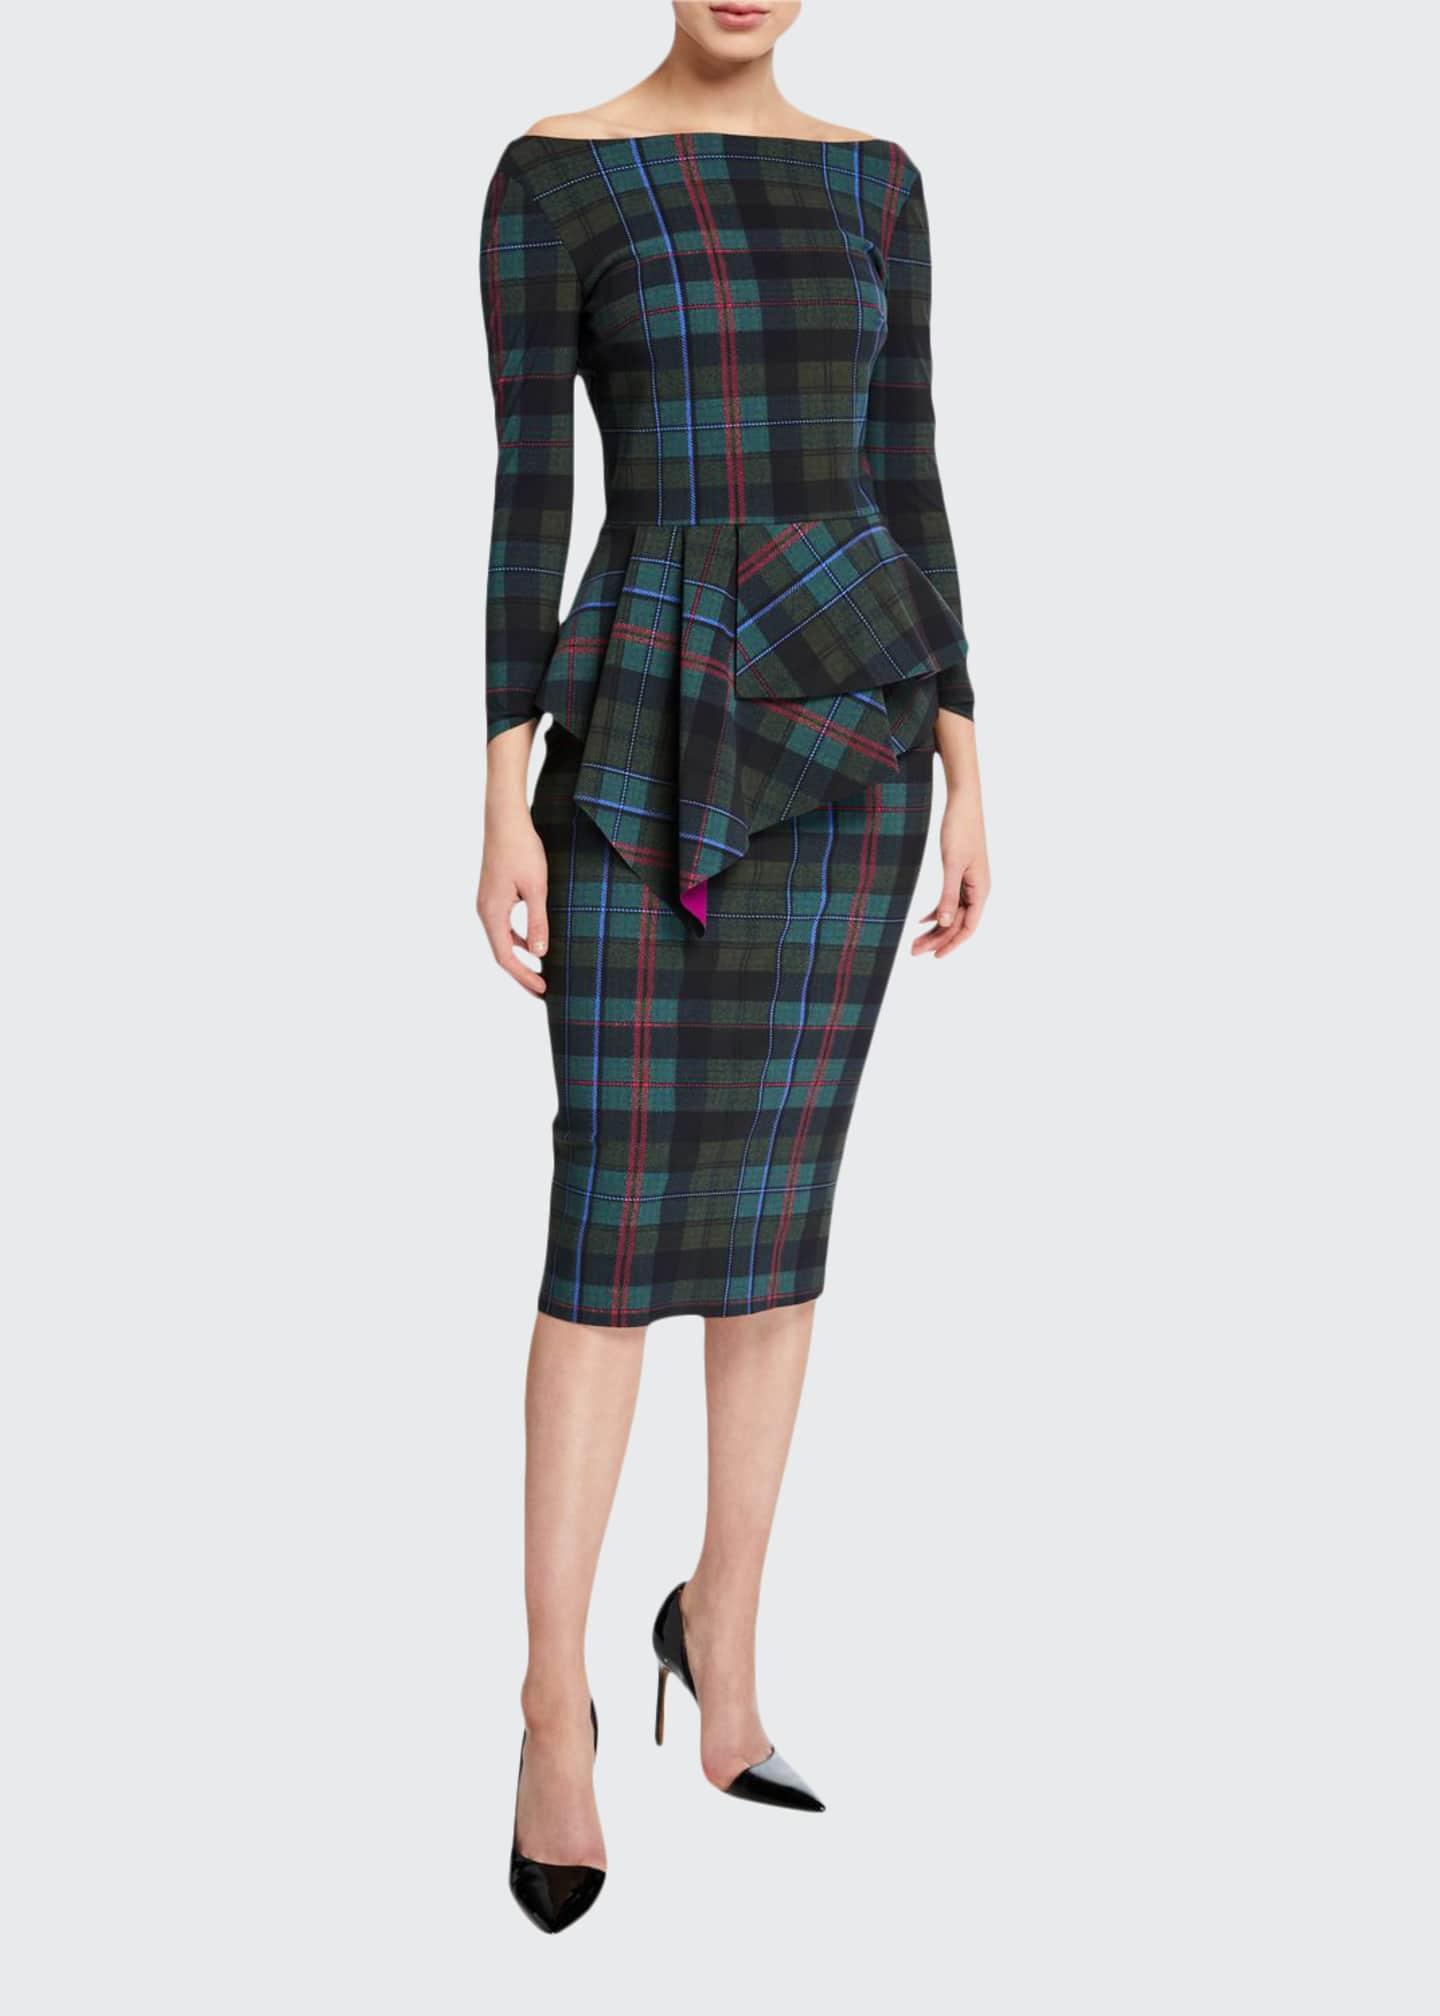 Chiara Boni La Petite Robe Plaid Off-the-Shoulder Long-Sleeve